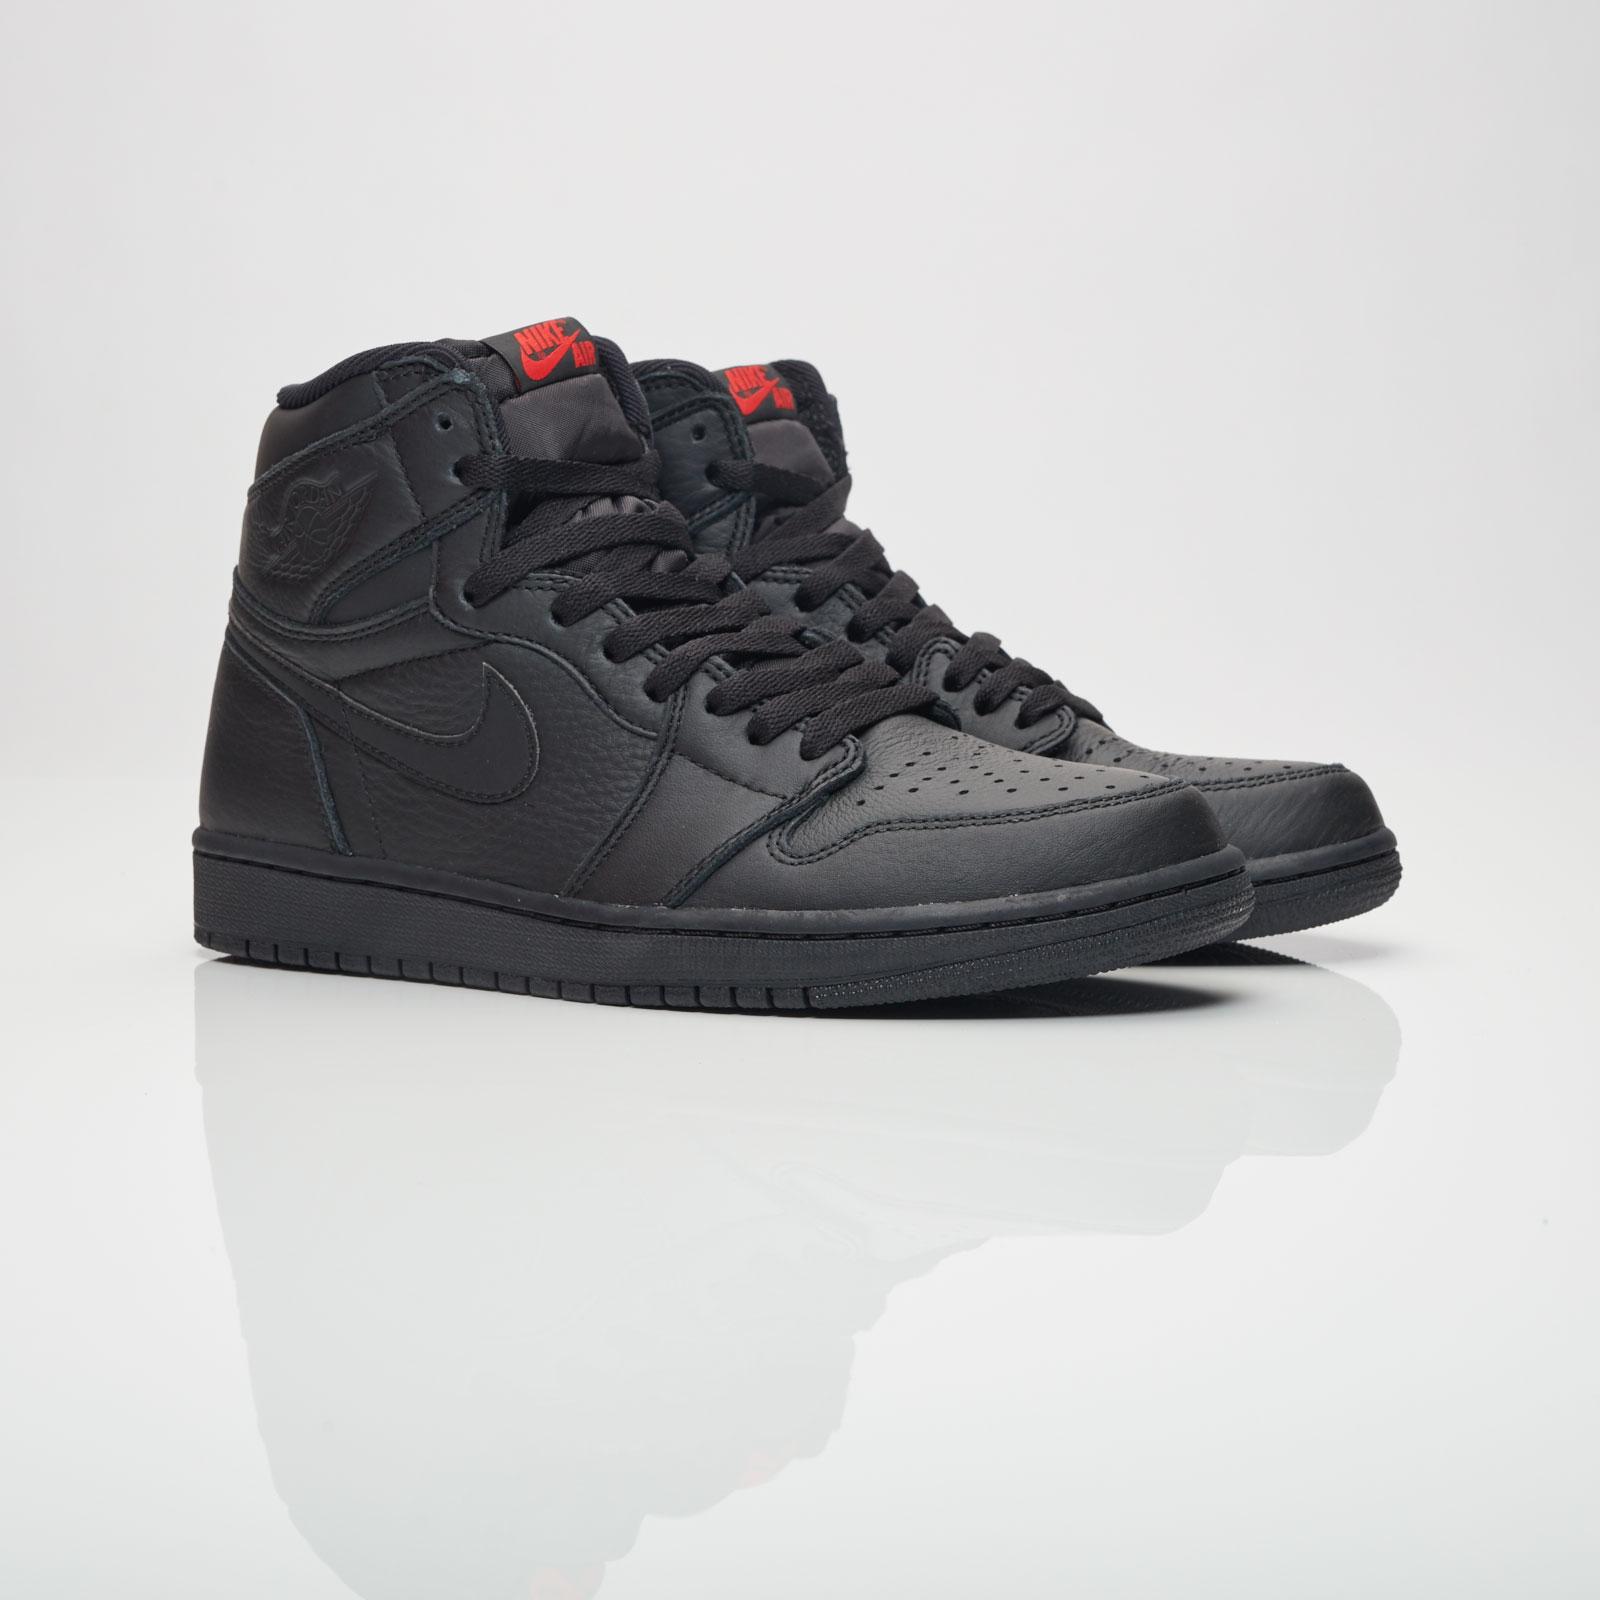 9ab8465c7a9992 The Triple Black Air Jordan 1 Retro High 555088 022 Is Available Now ...